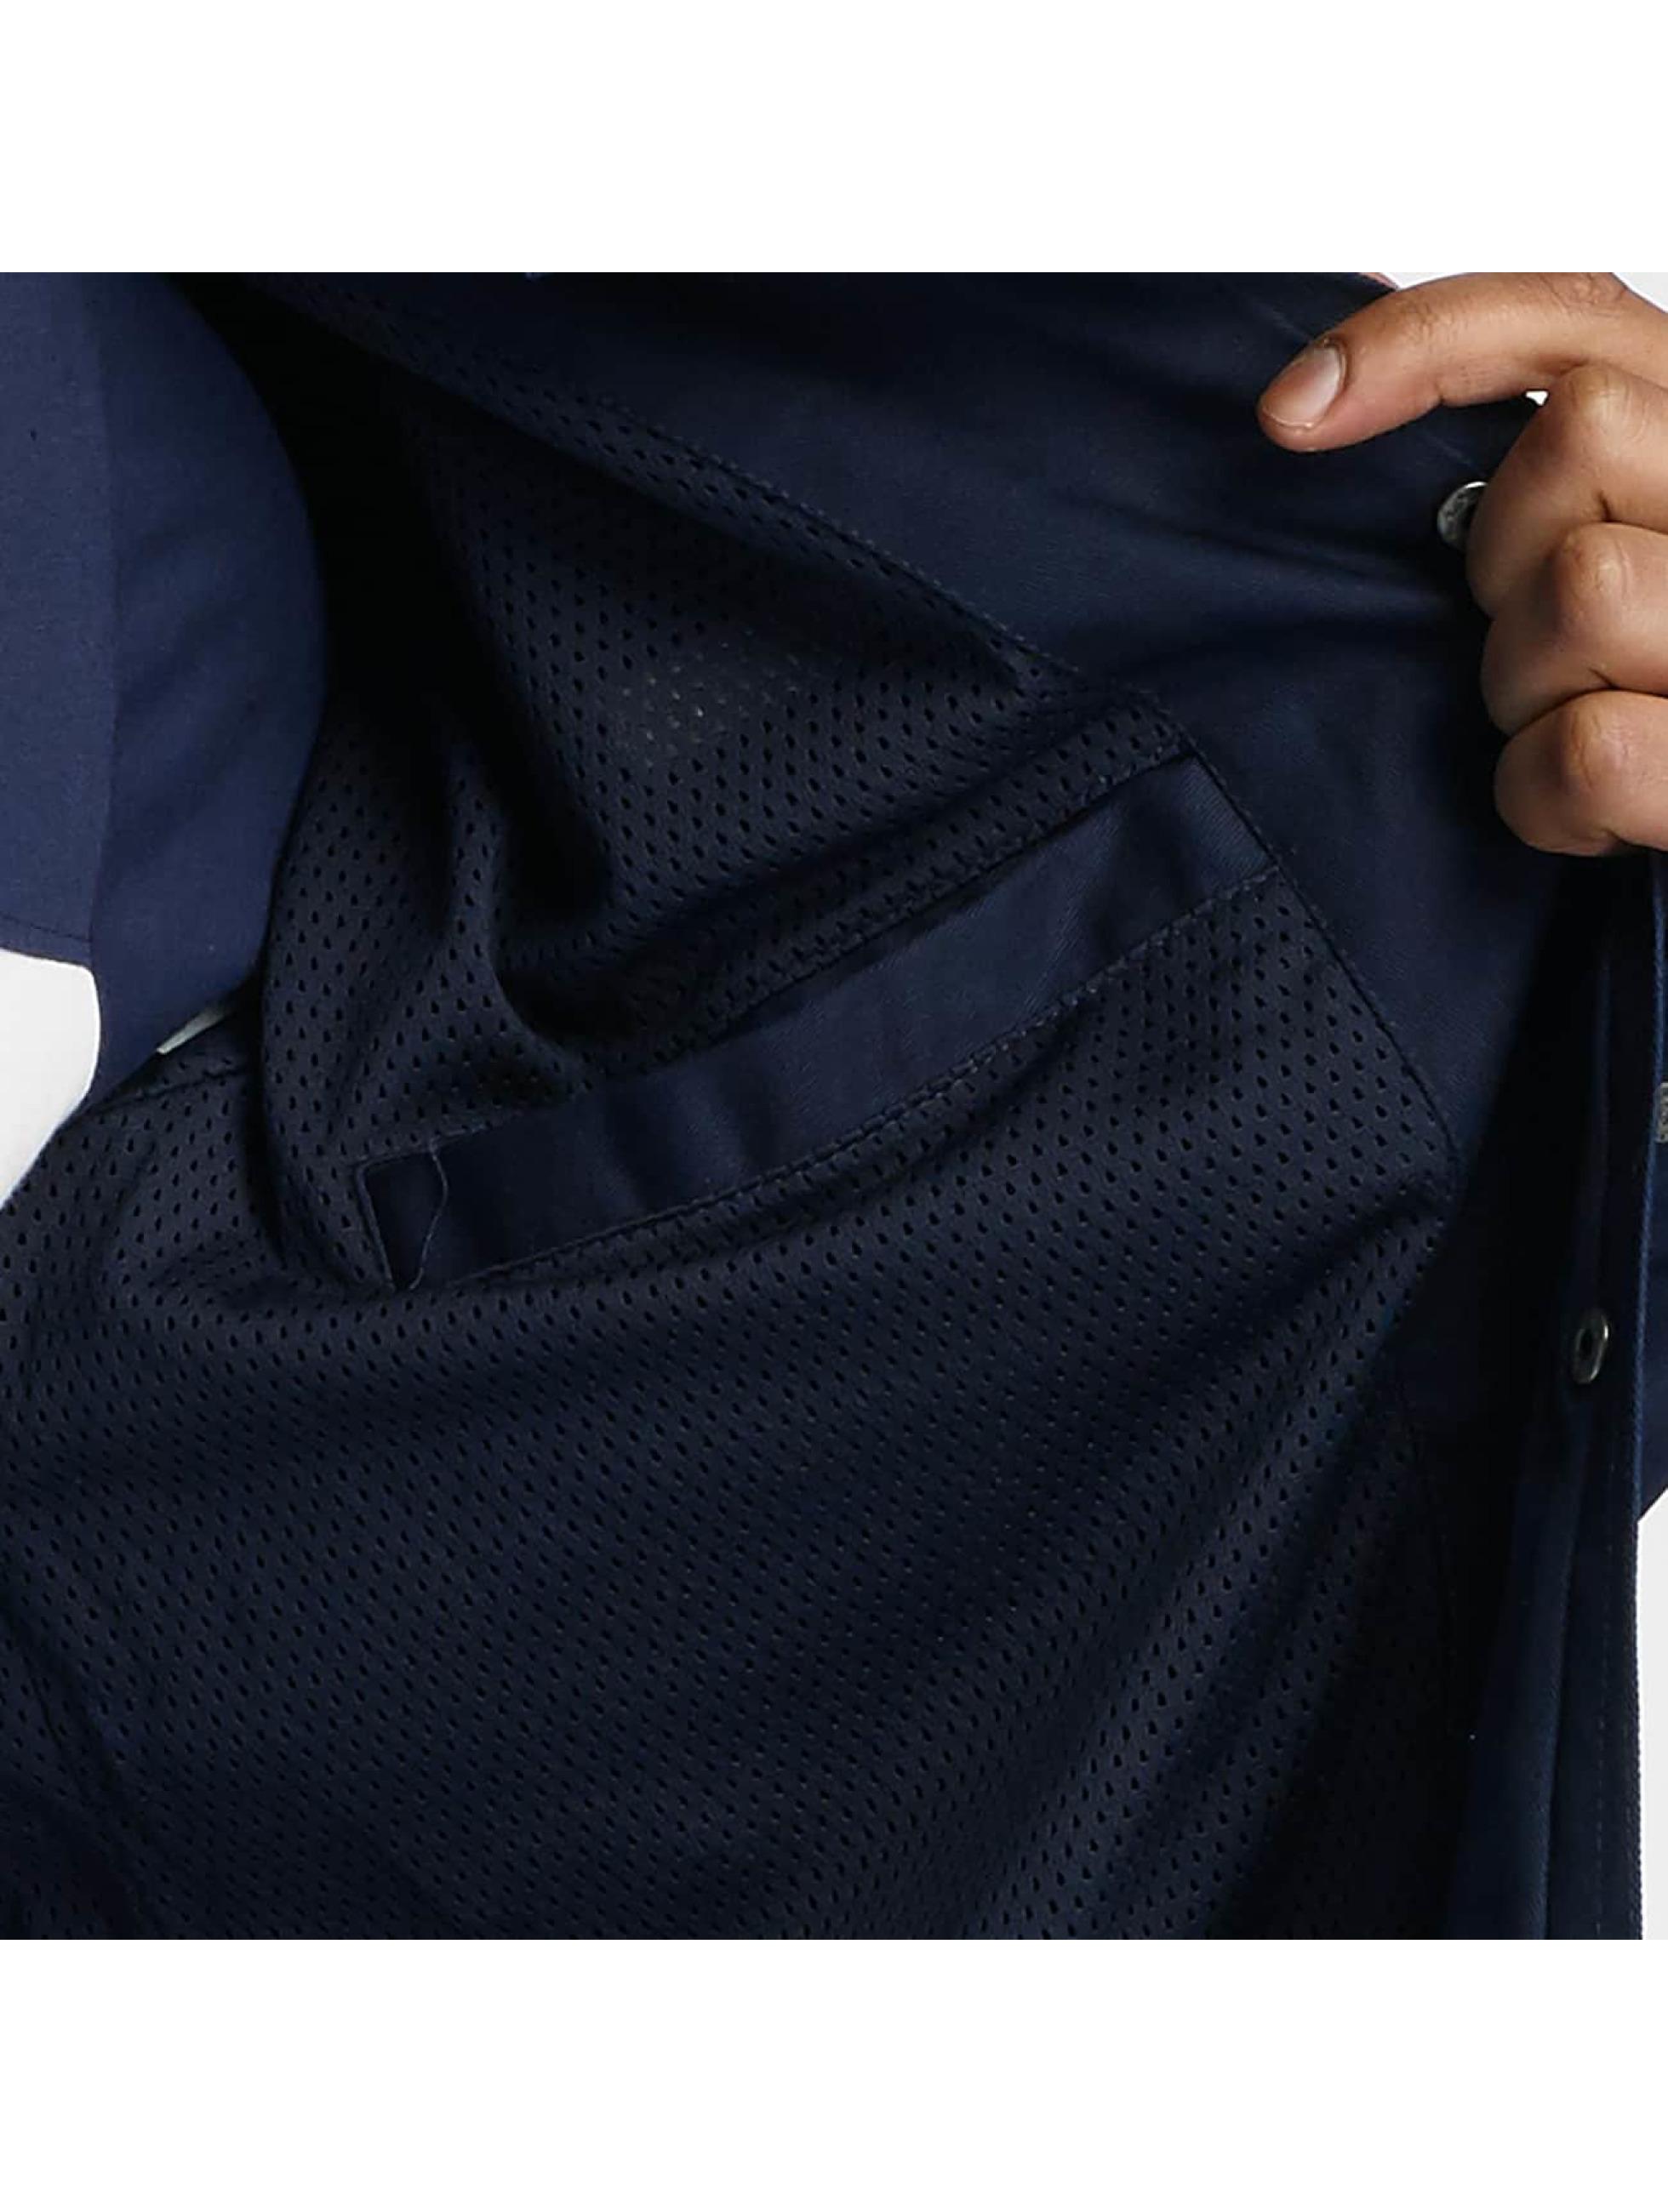 Wrung Division Lightweight Jacket Coach Snap blue